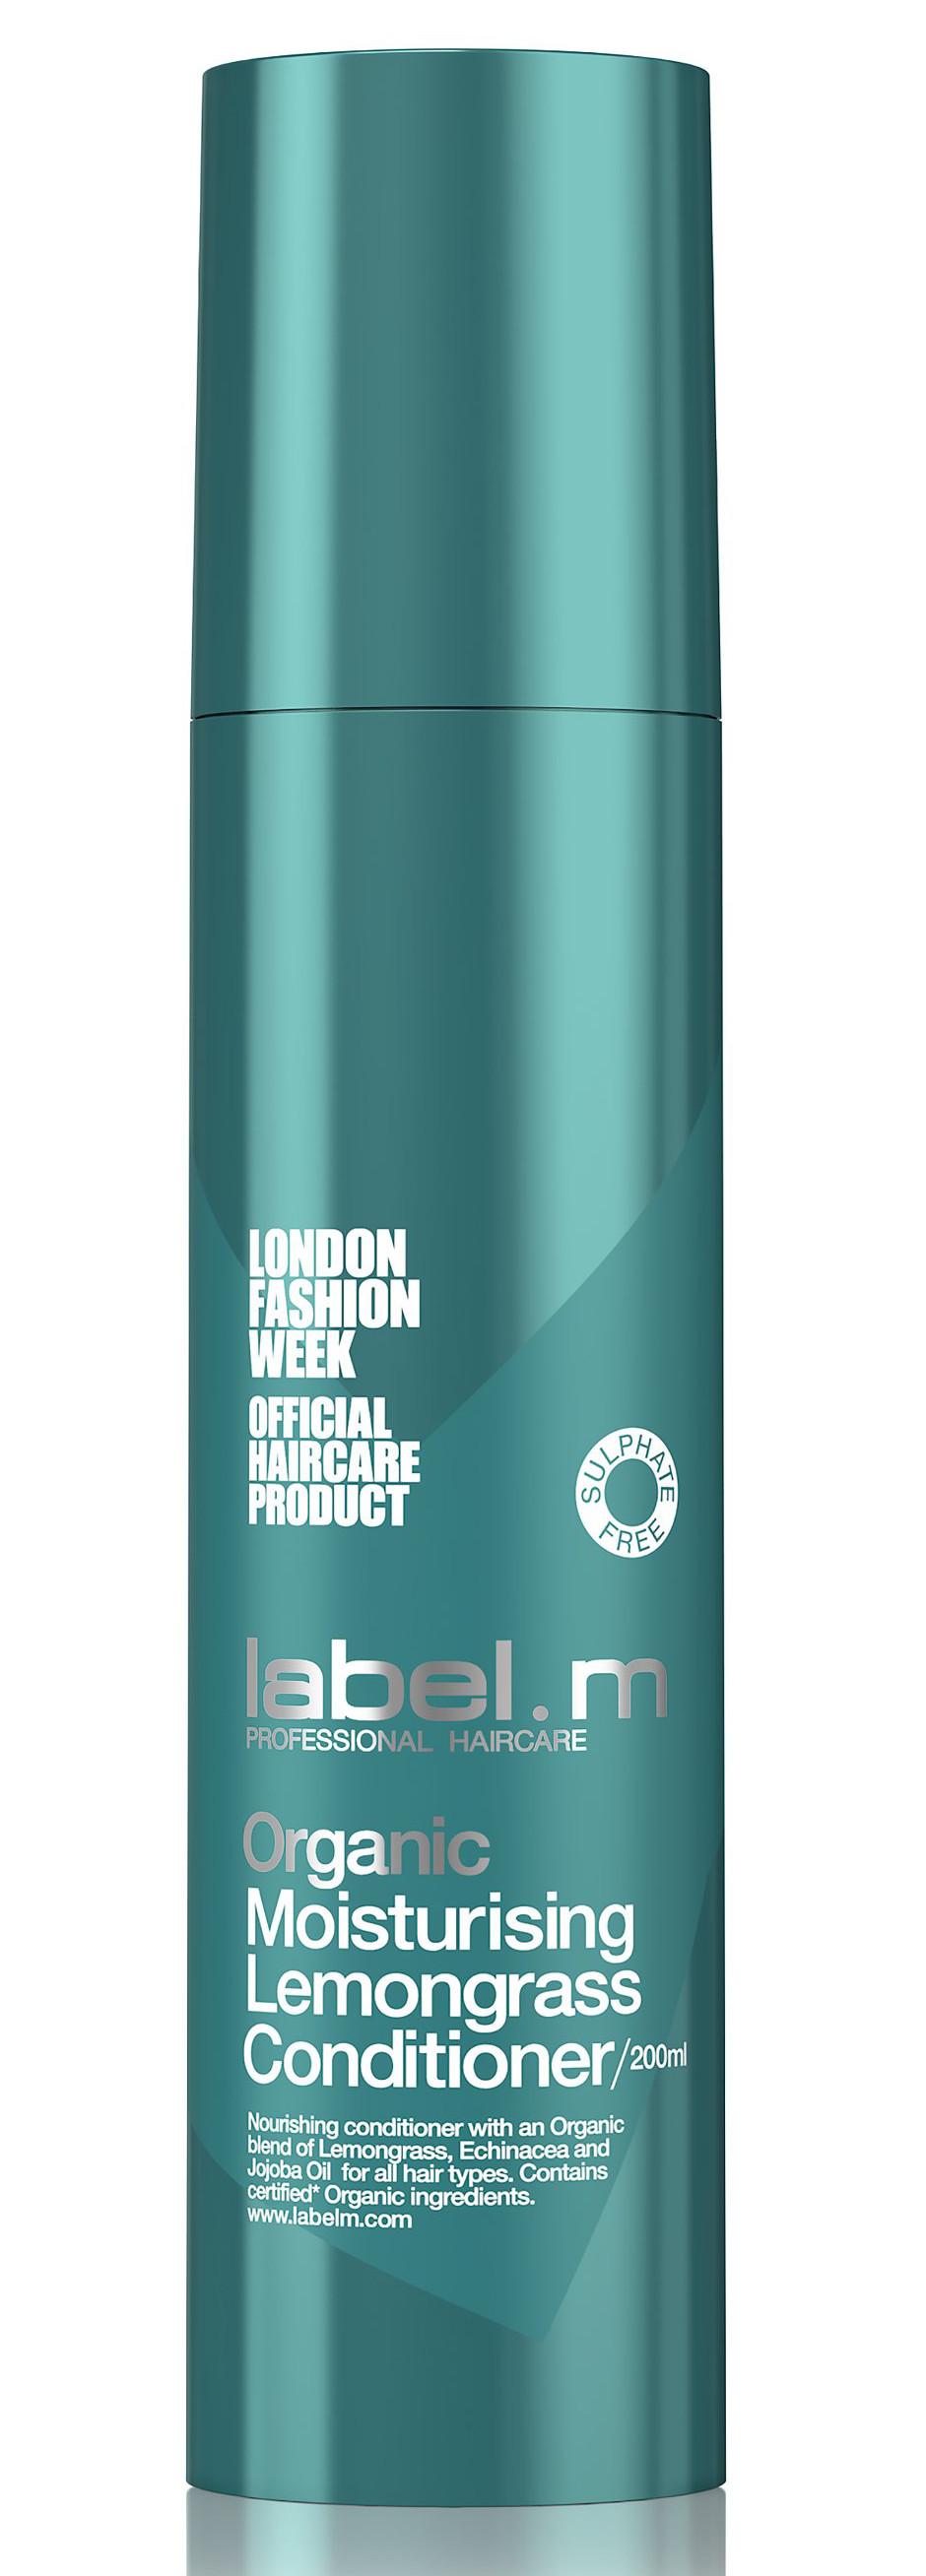 Hydratační kondicionér Label.m Organic Moisturising Lemongrass - 200 ml (600081) + DÁREK ZDARMA